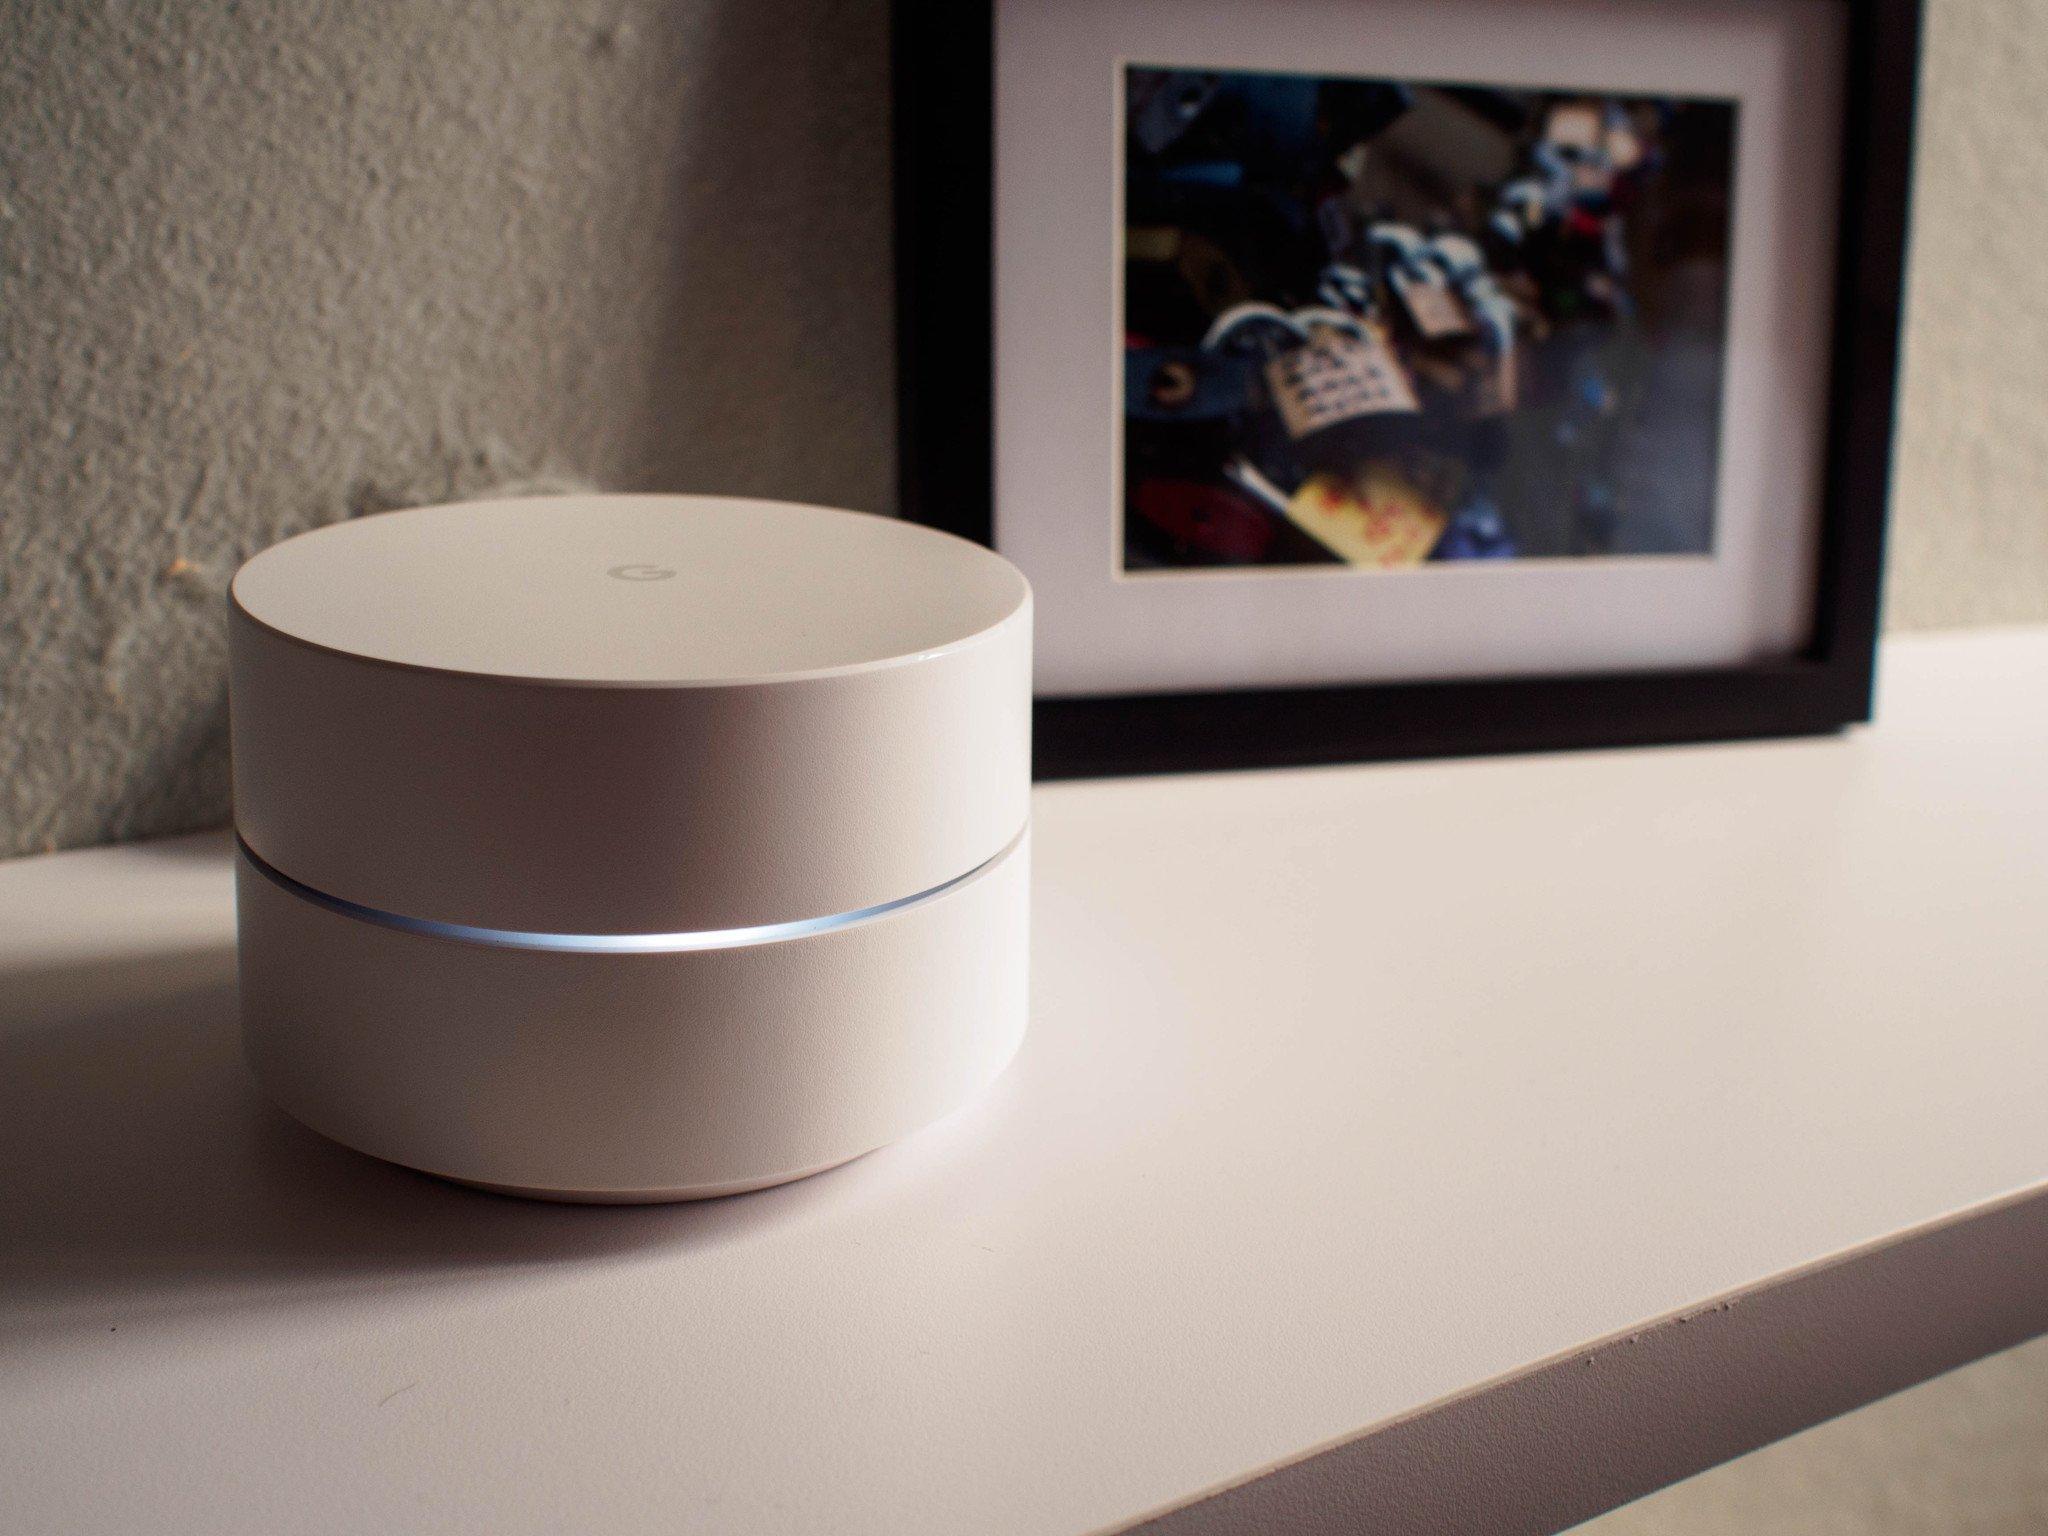 hight resolution of google wifi